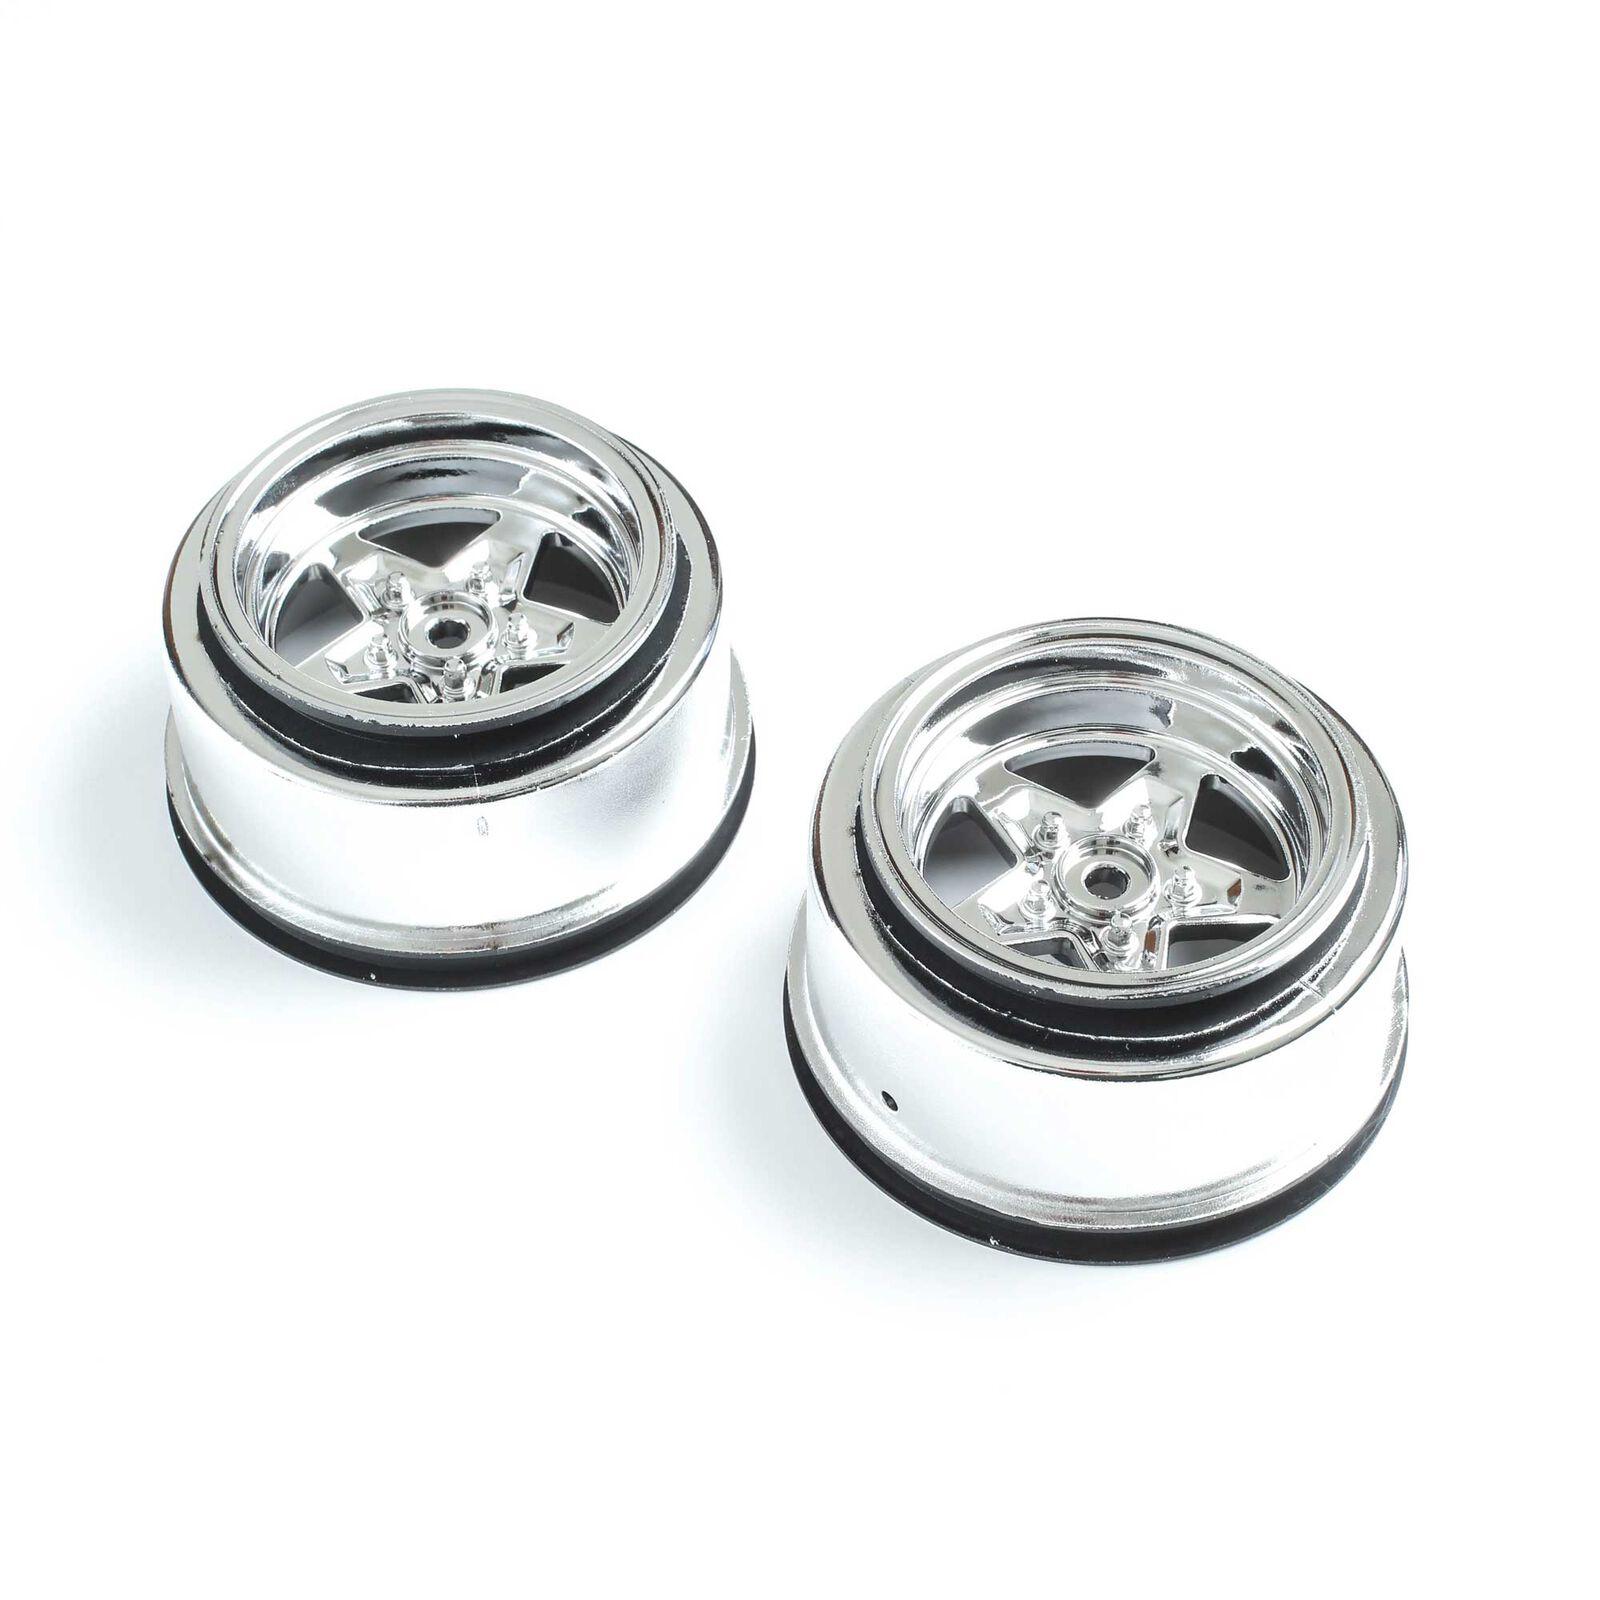 Rear Wheel, Chrome (2): 22S Drag